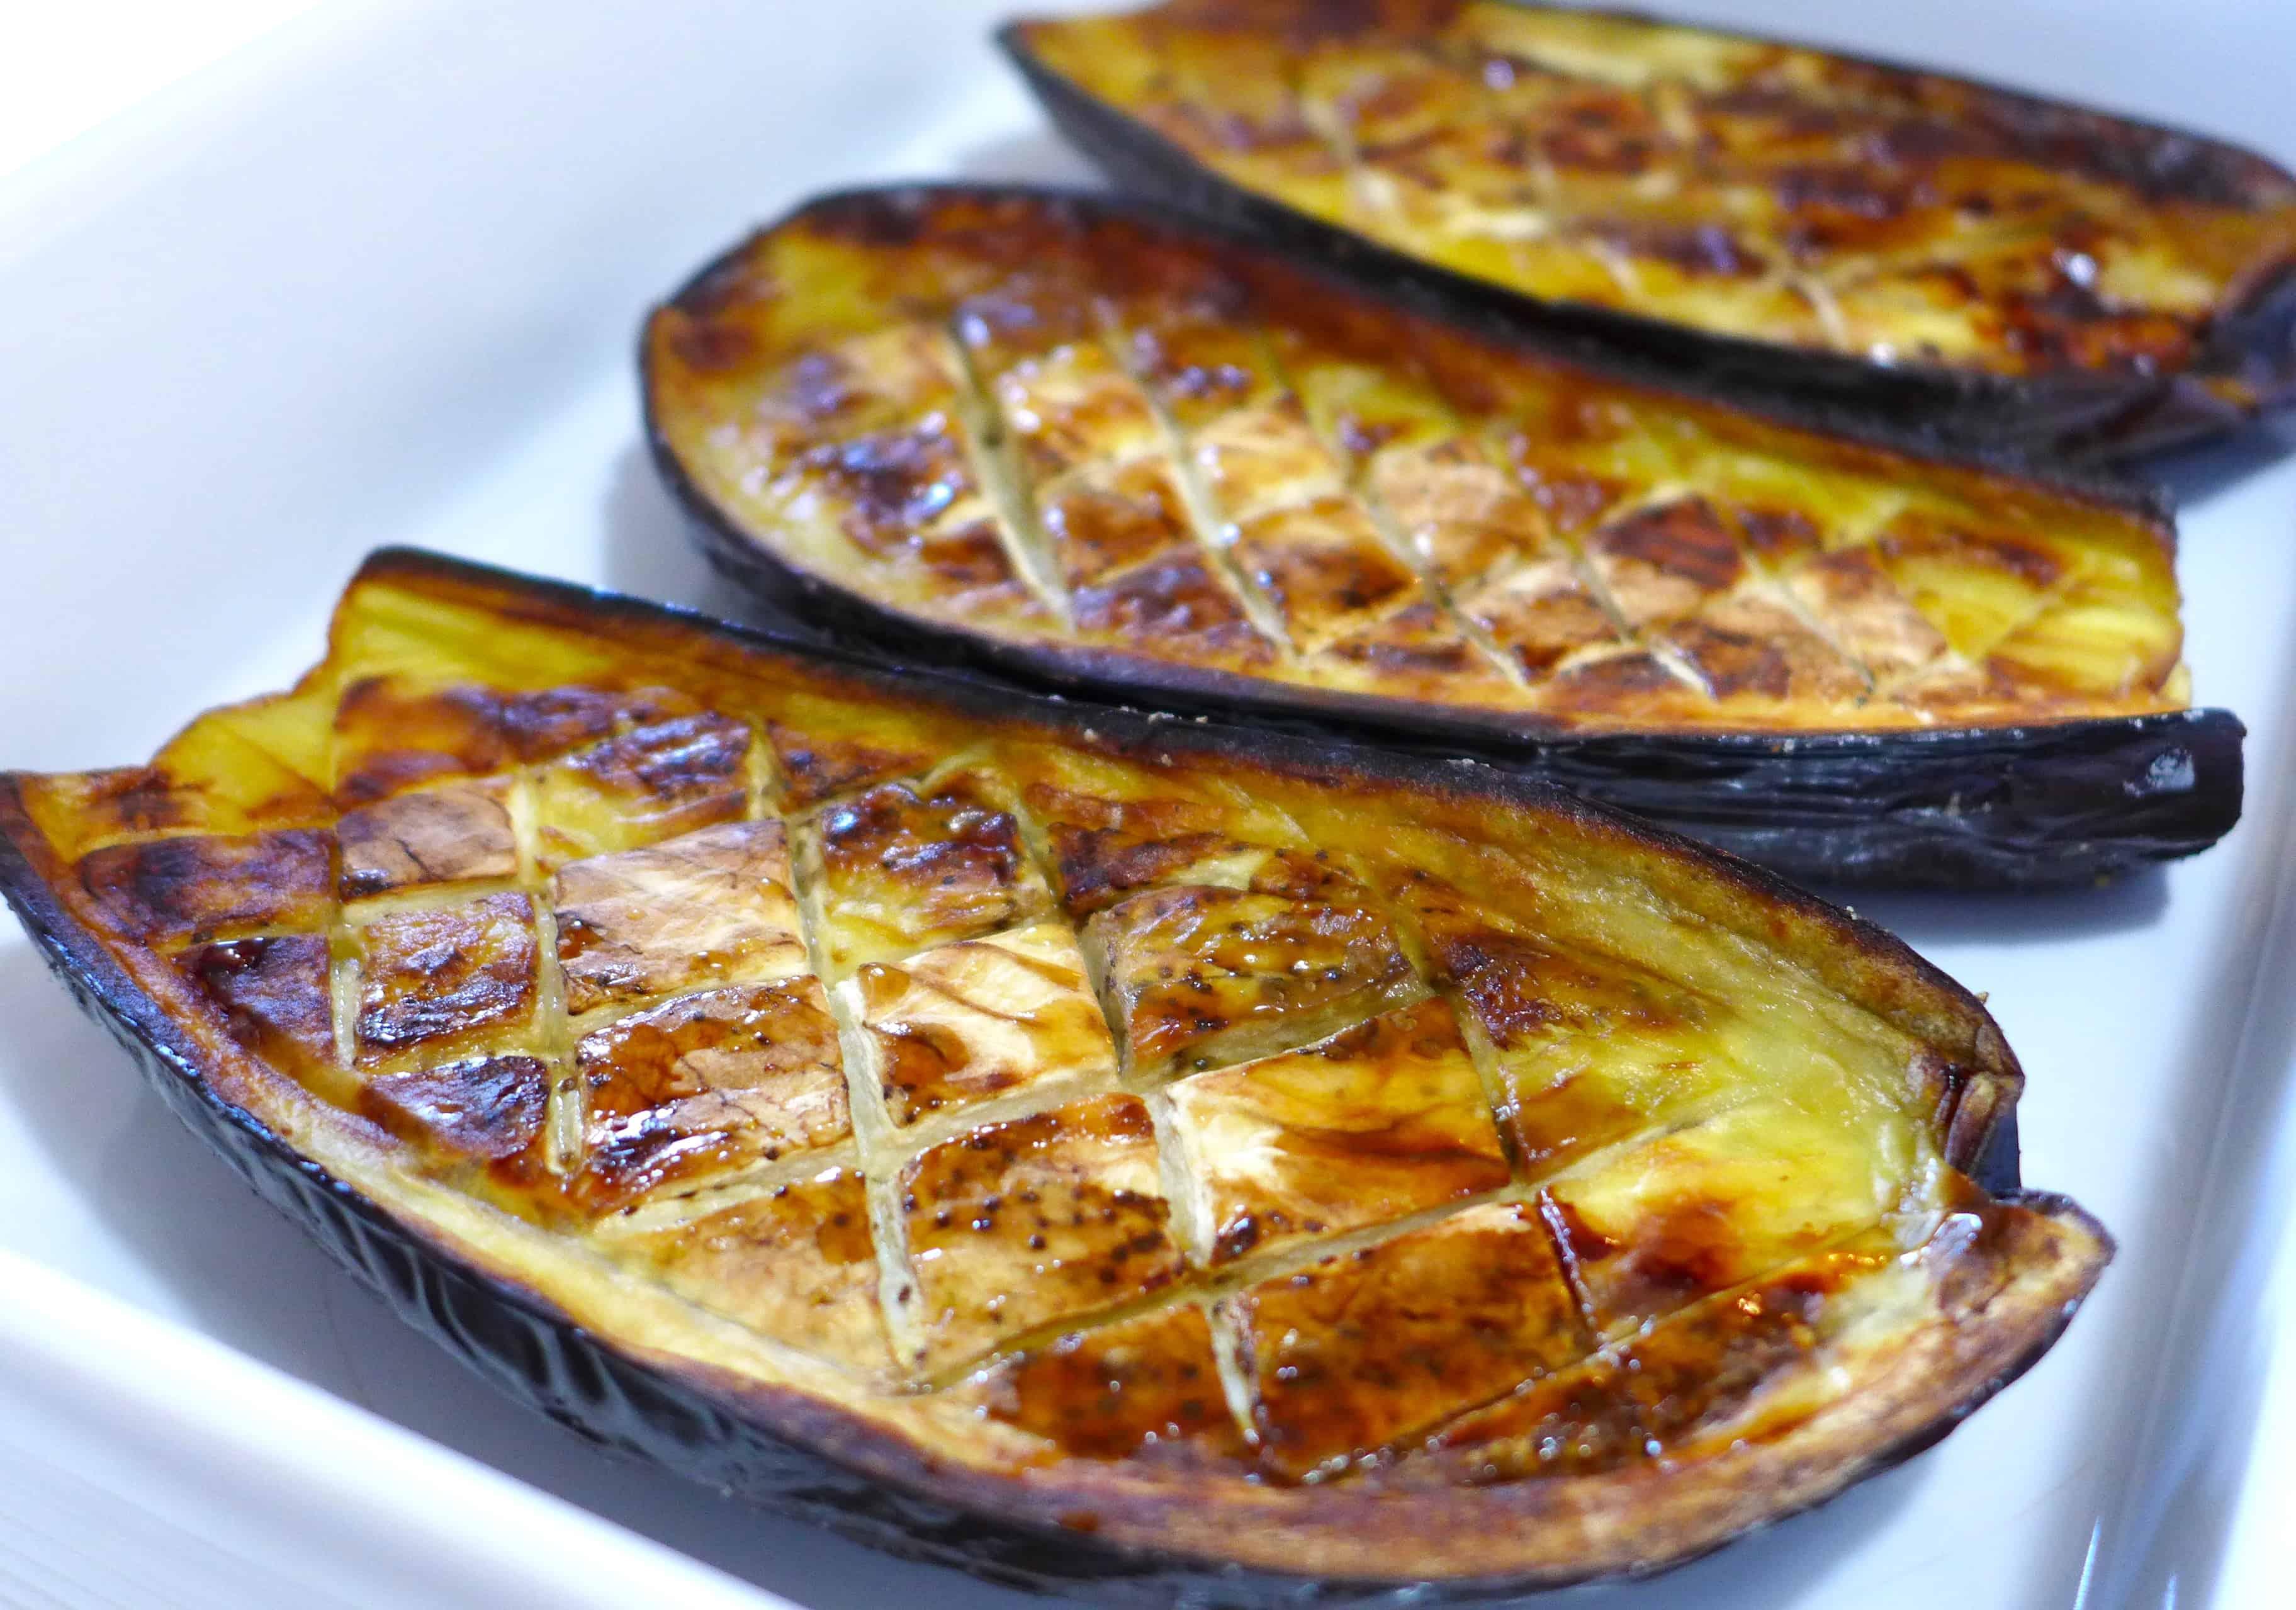 Greek stuffed eggplant recipe melitzanes papoutsakia prep my view recipe forumfinder Image collections